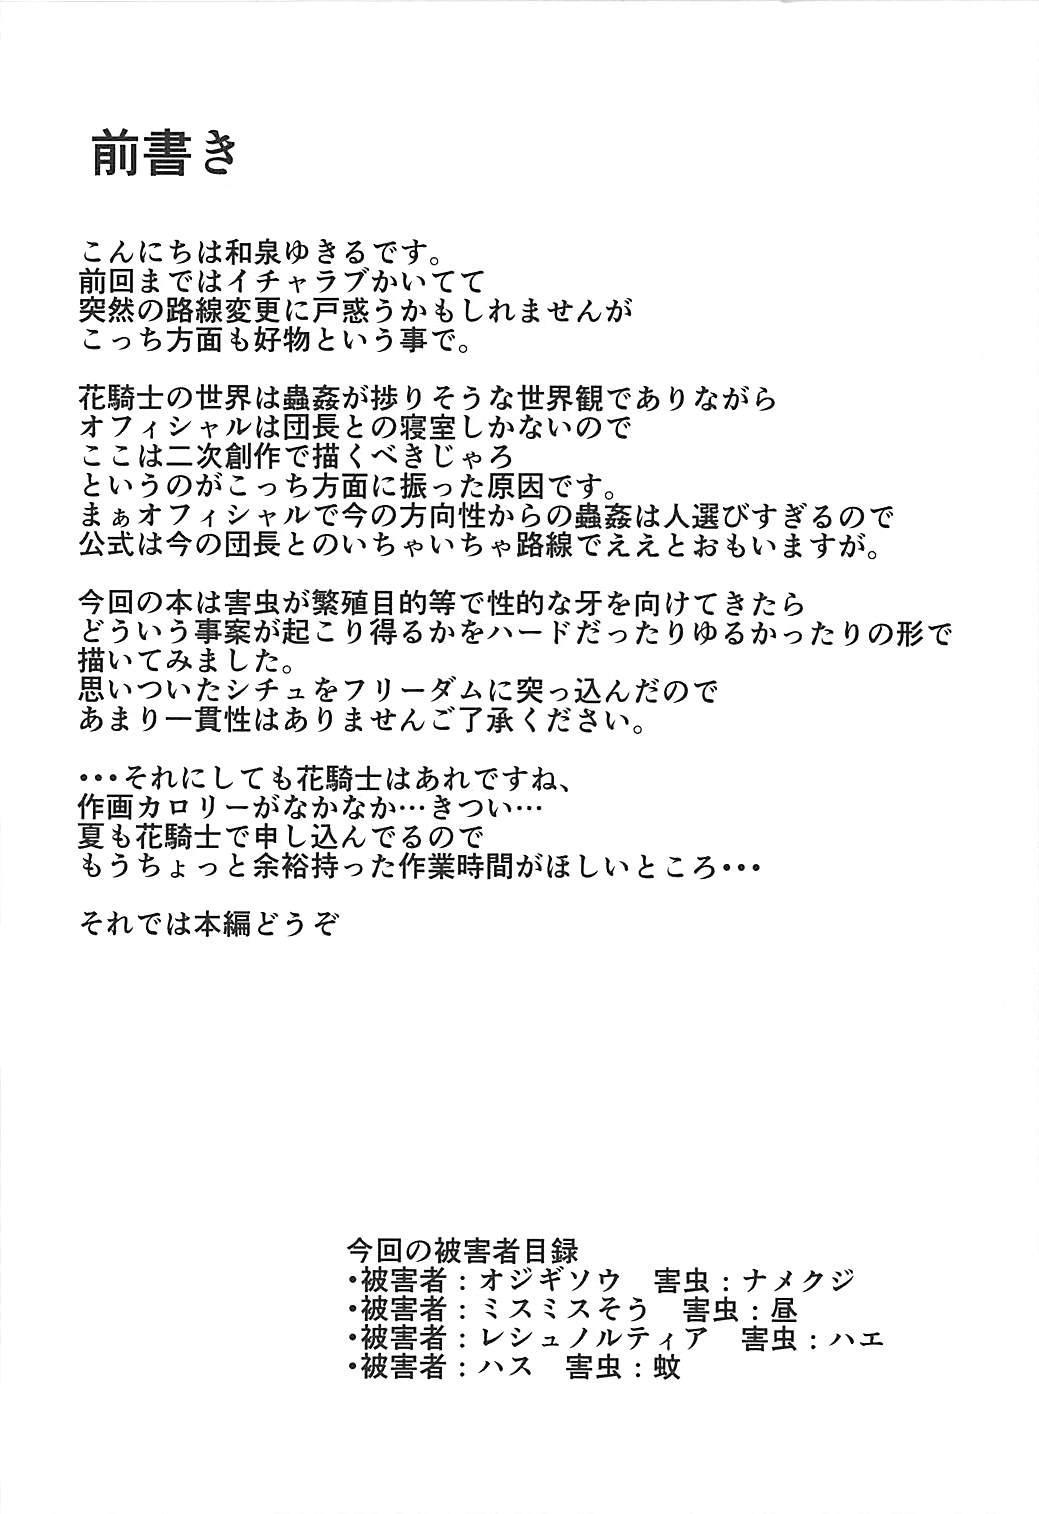 Gaichuu Higai Houkokusho 2